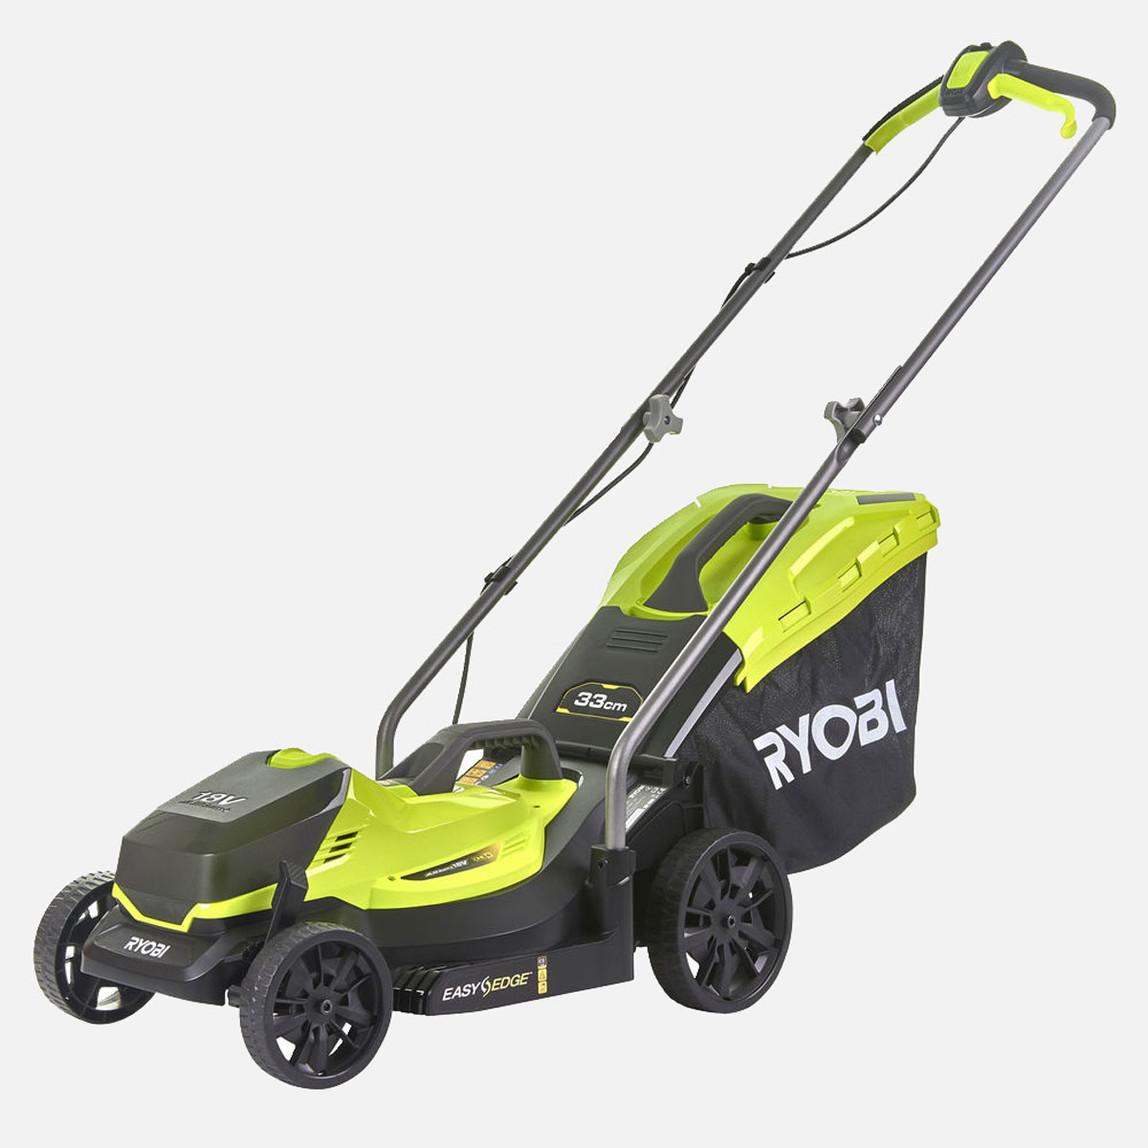 18V Akülü Tekerlekli Çim Biçme Makinası  1X4Ah   Rlm18X33B-40